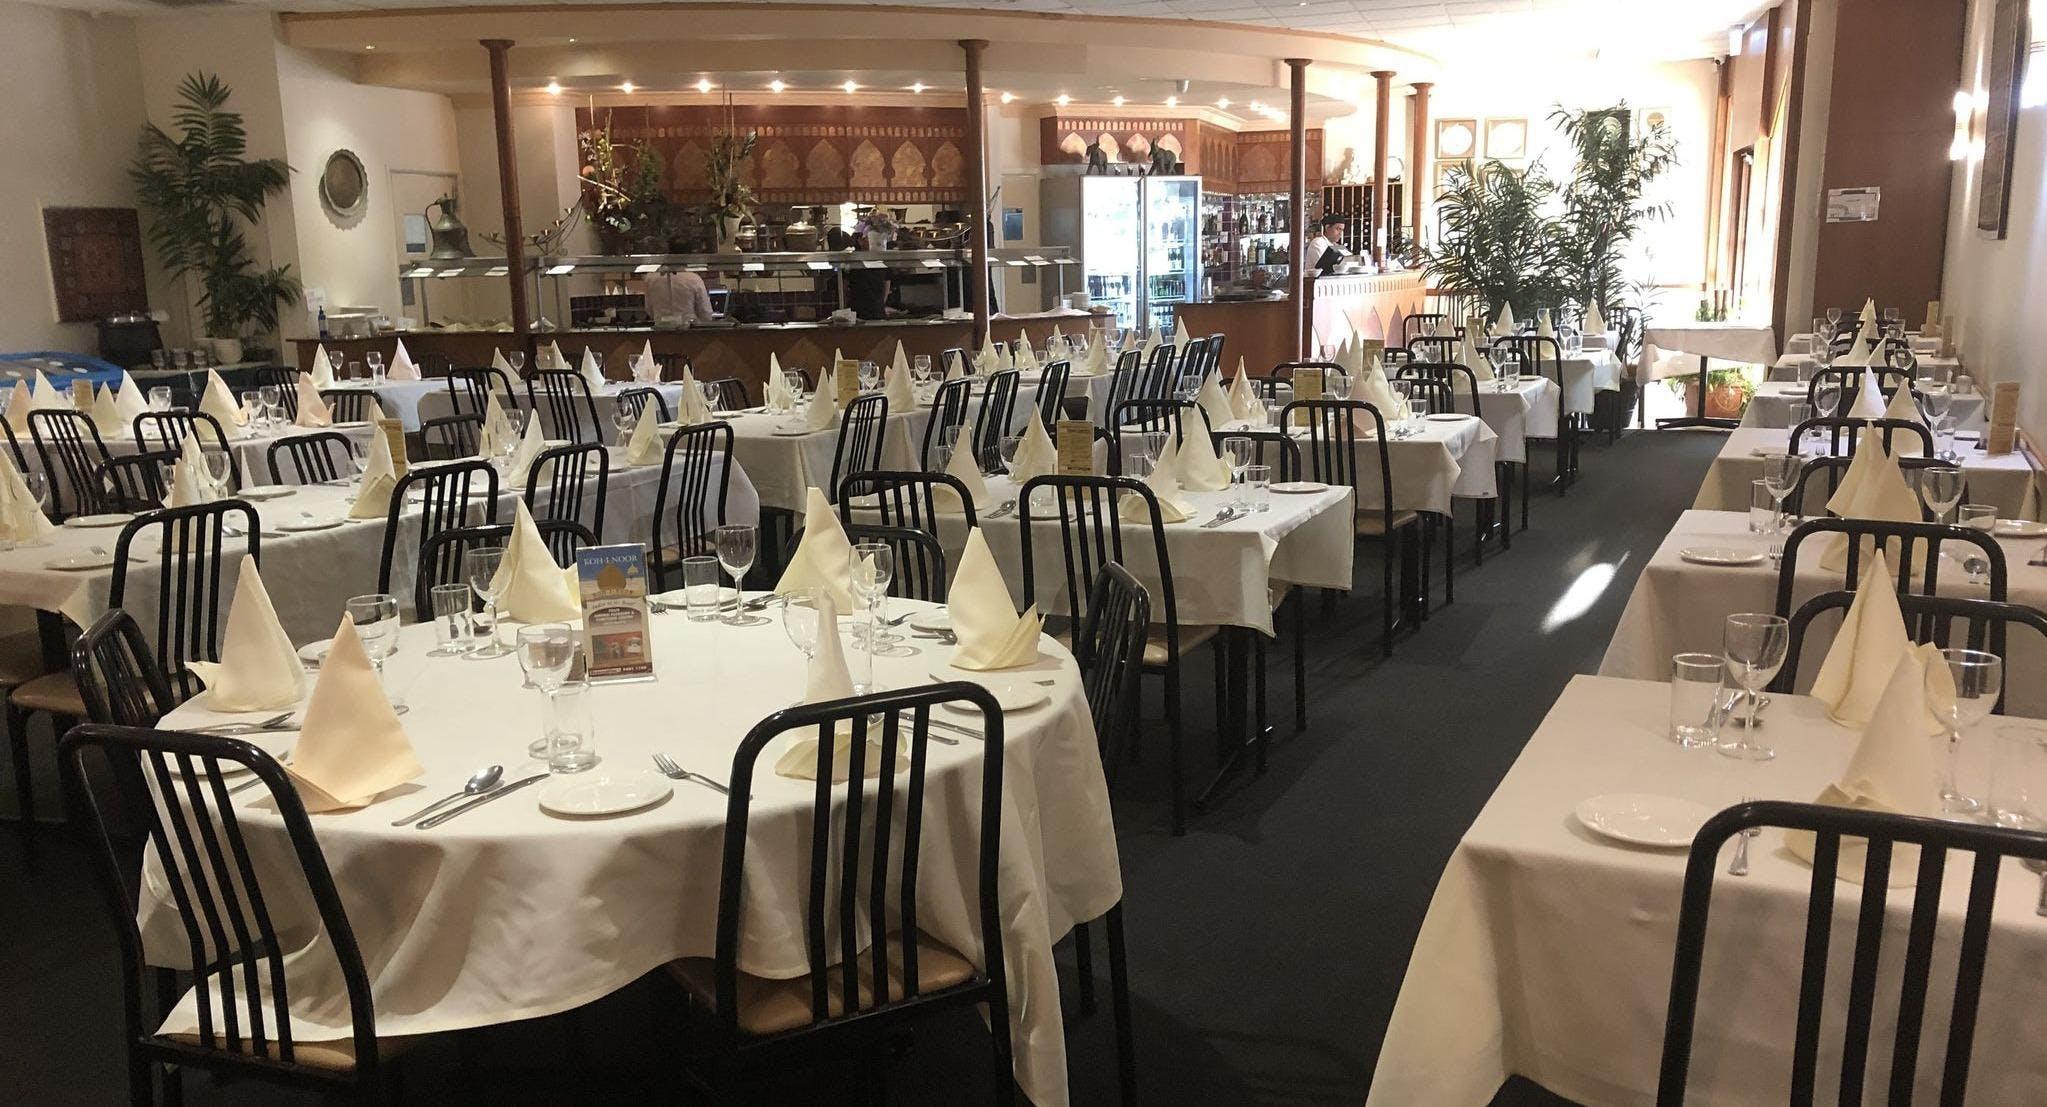 Photo of restaurant Koh-I-Noor Indian Restaurant in Padbury, Perth